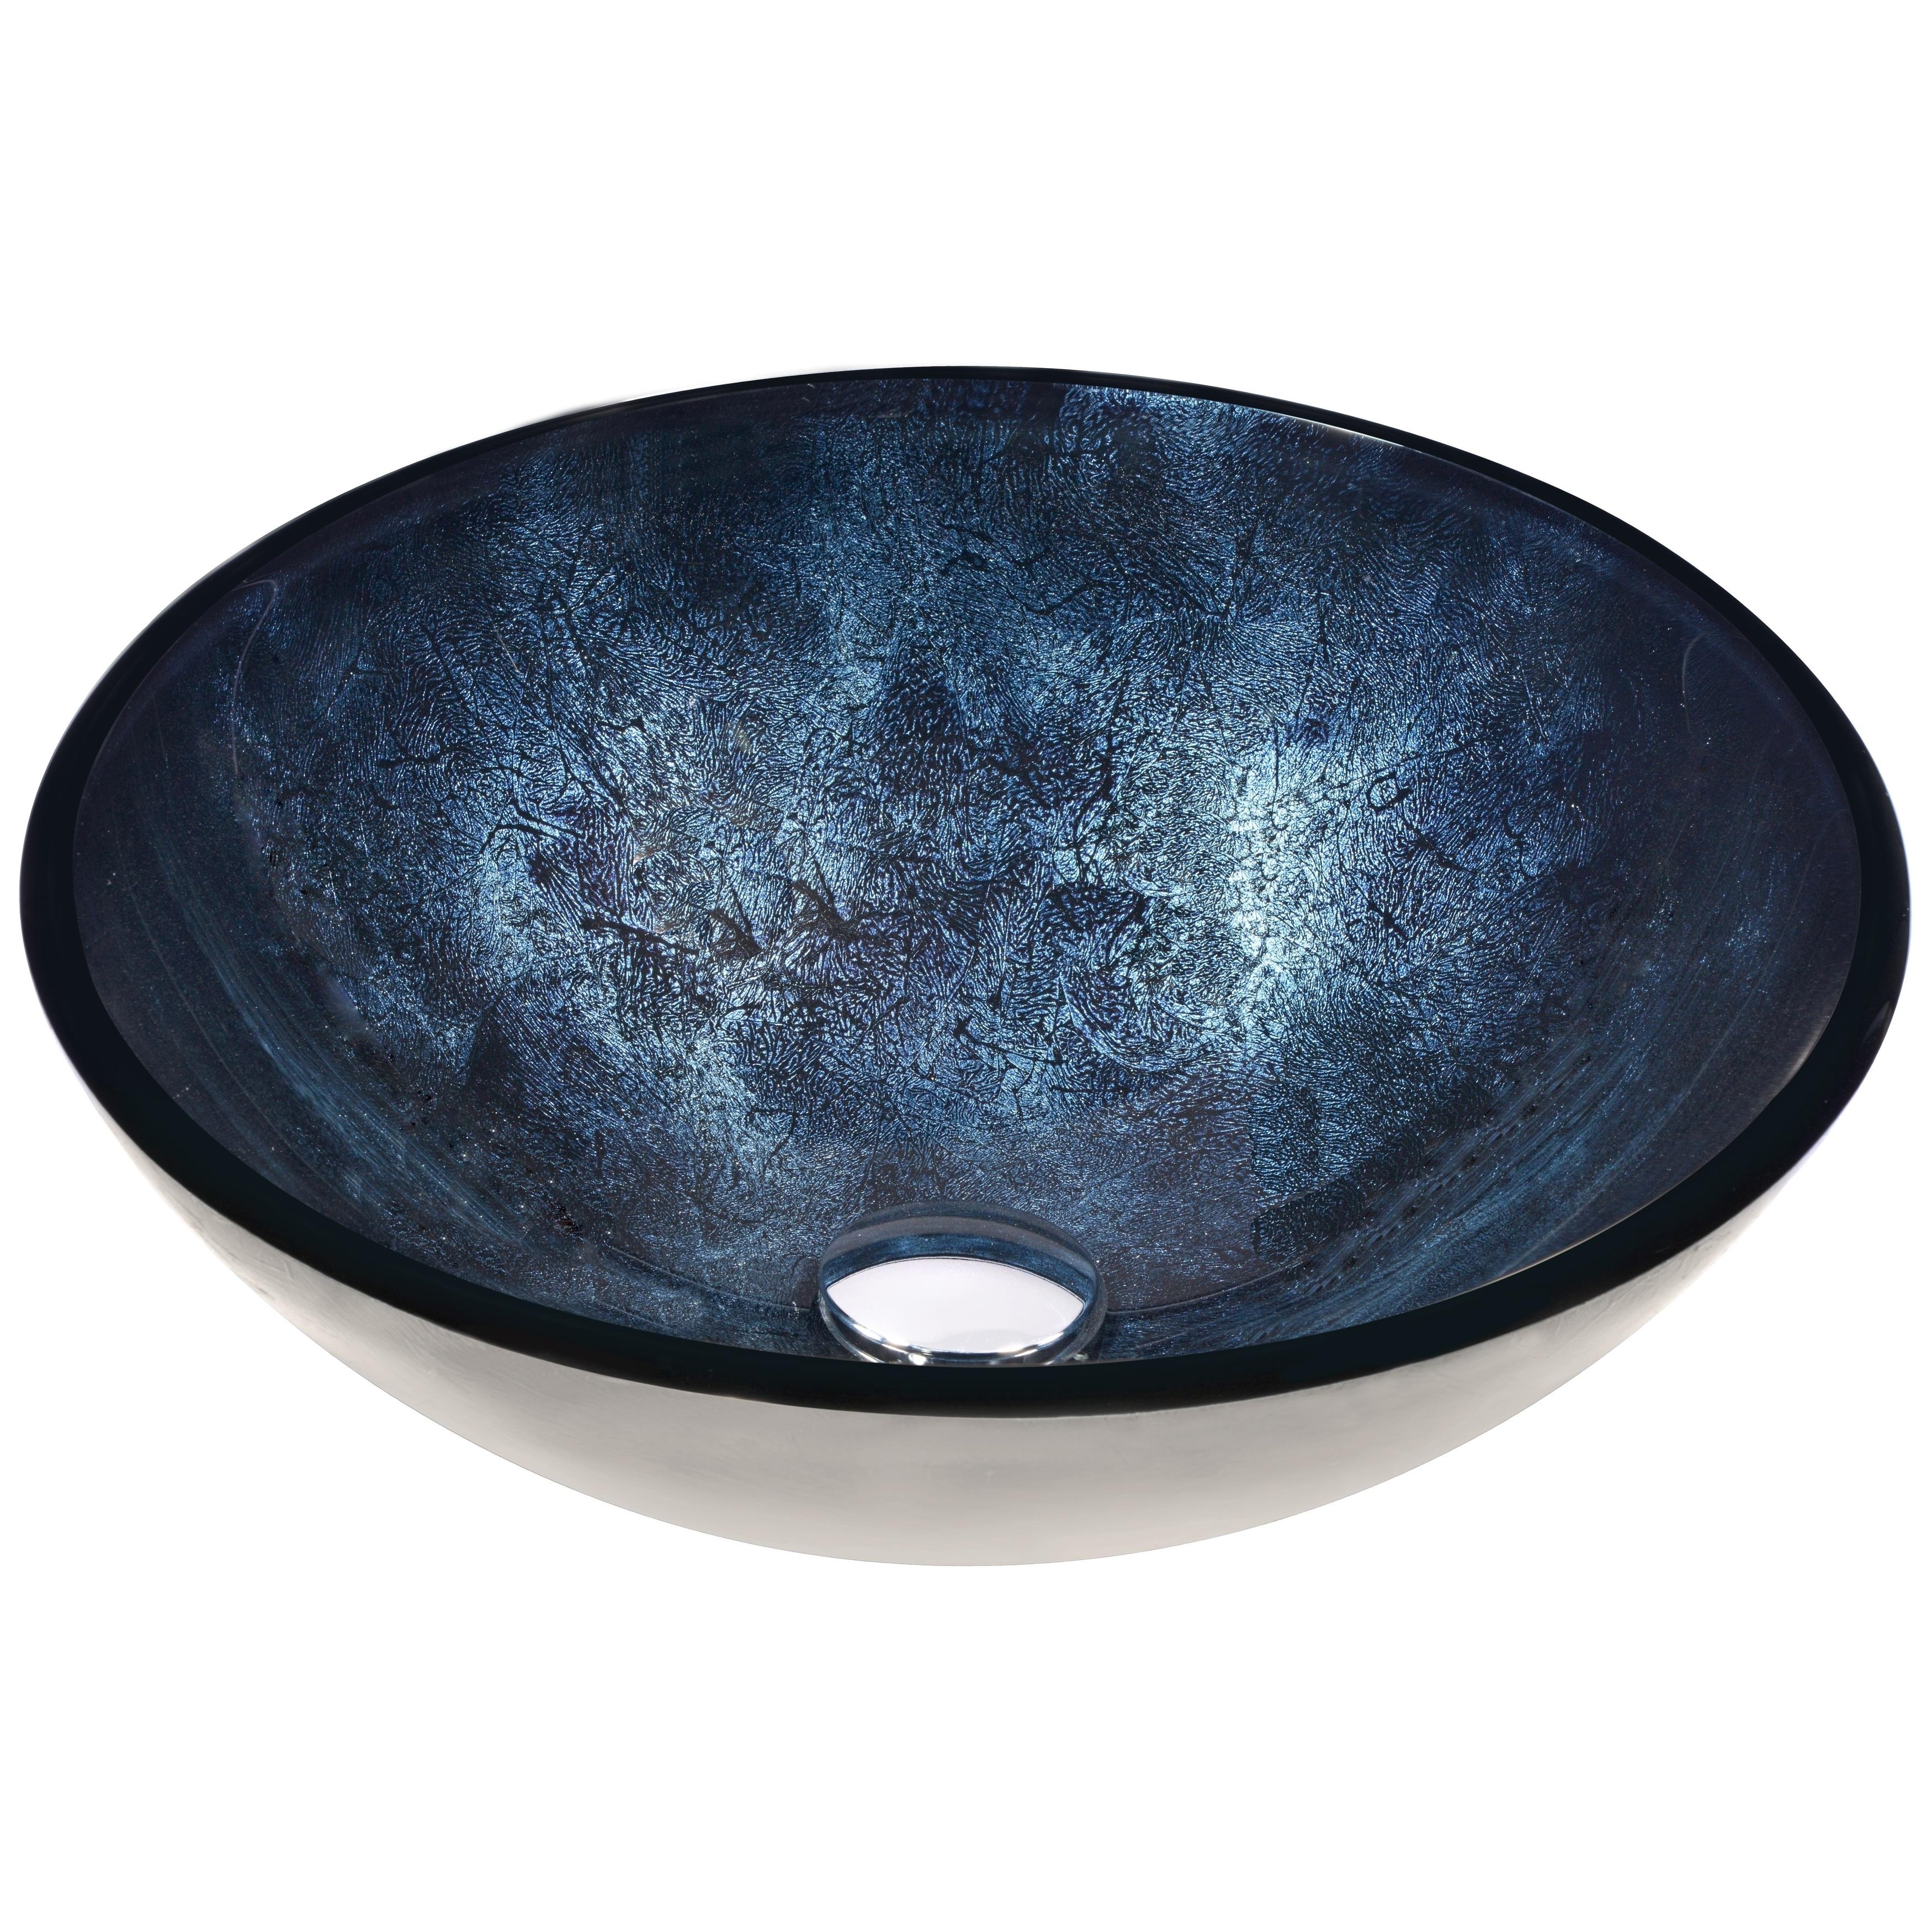 Buy Black, Vessel Bathroom Sinks Online at Overstock.com   Our Best ...